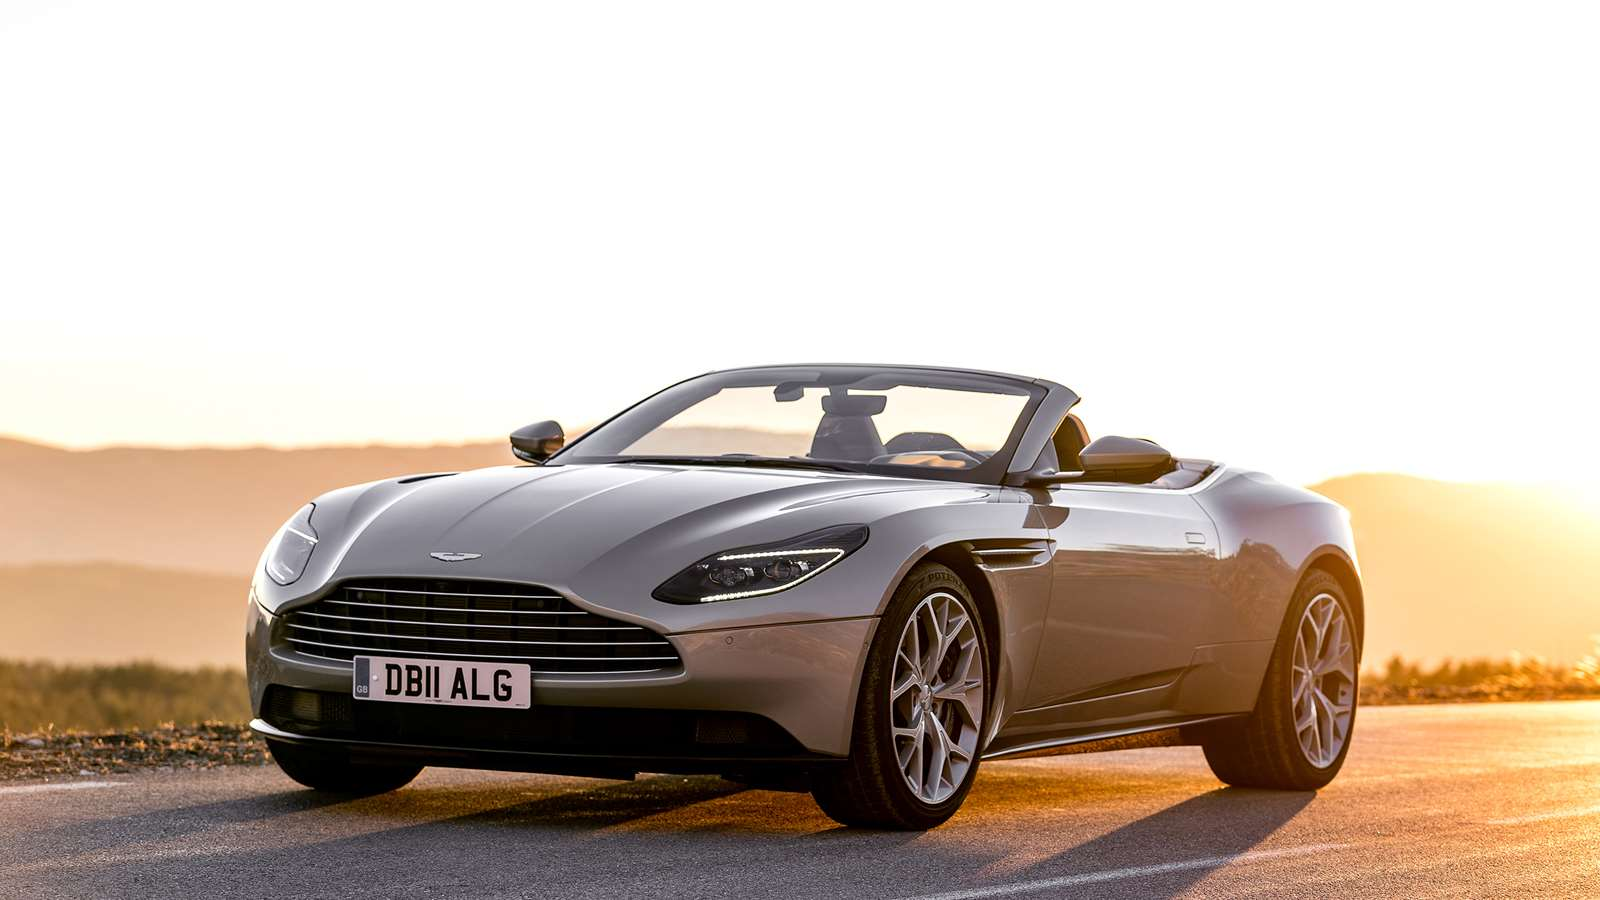 First Drive Aston Martin Db11 Volante